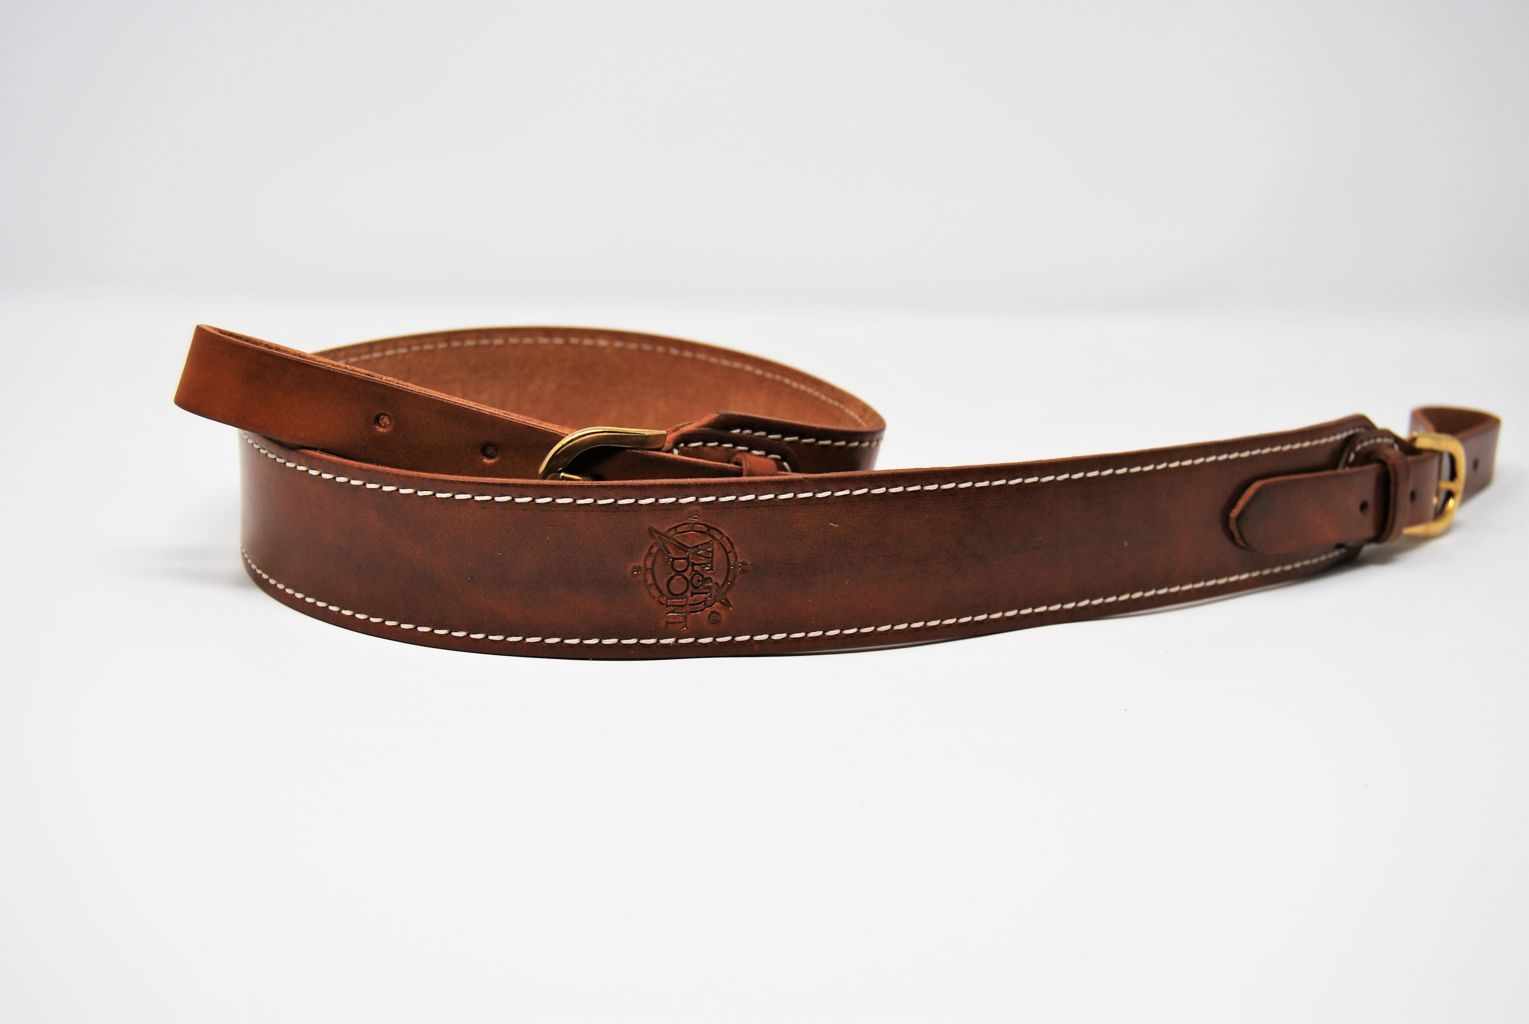 Cintura cuoio carabina mm 40 cucita CI 25